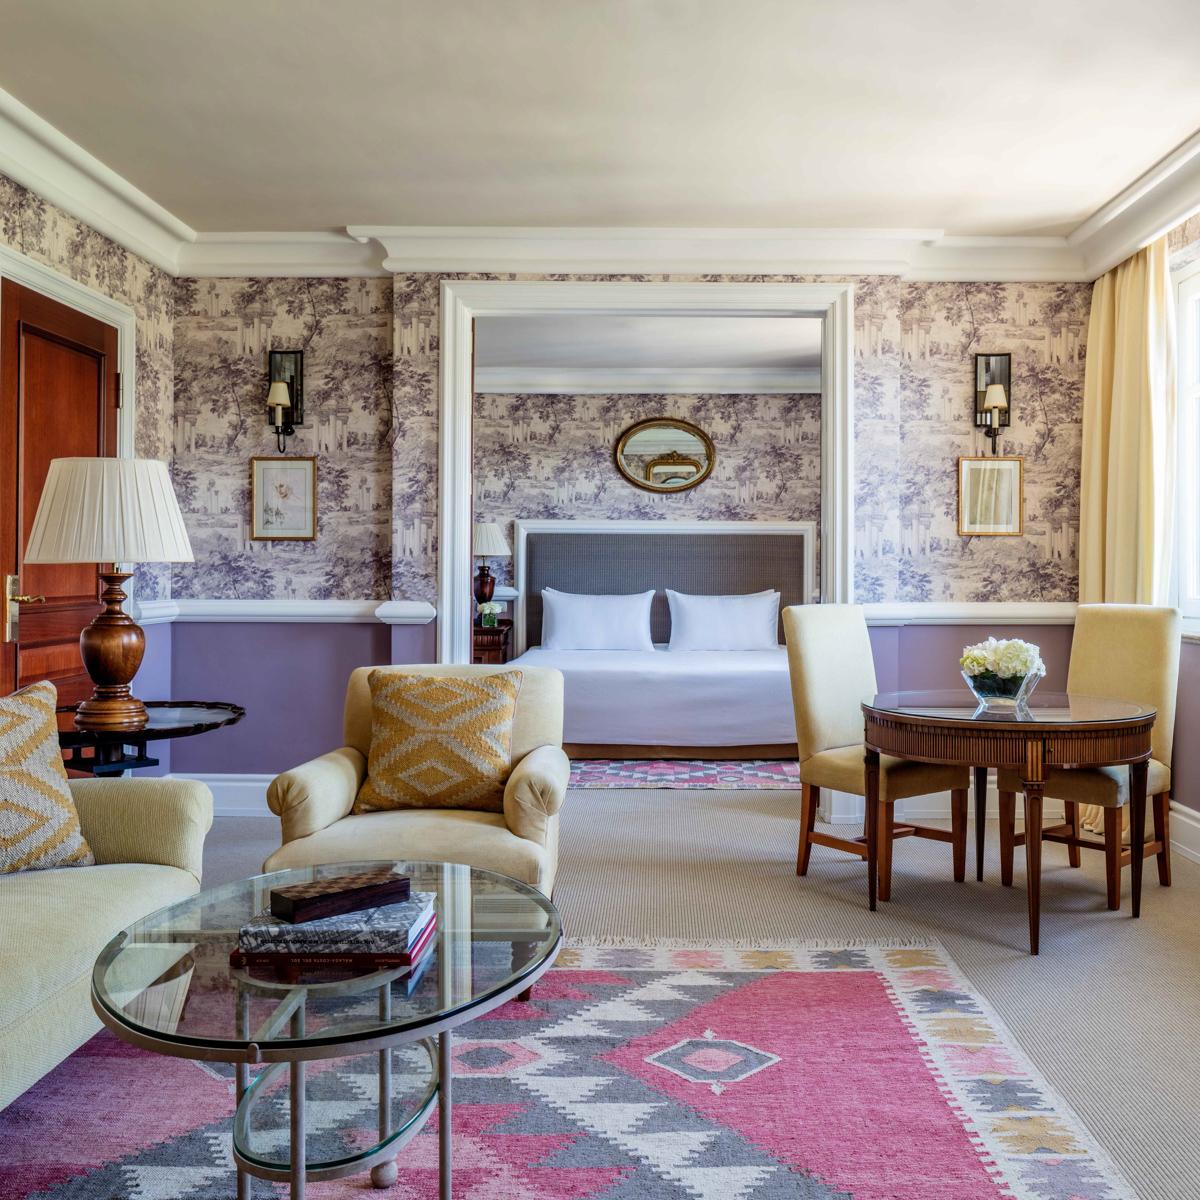 Anantara Luxus Hotel in Marbella-6